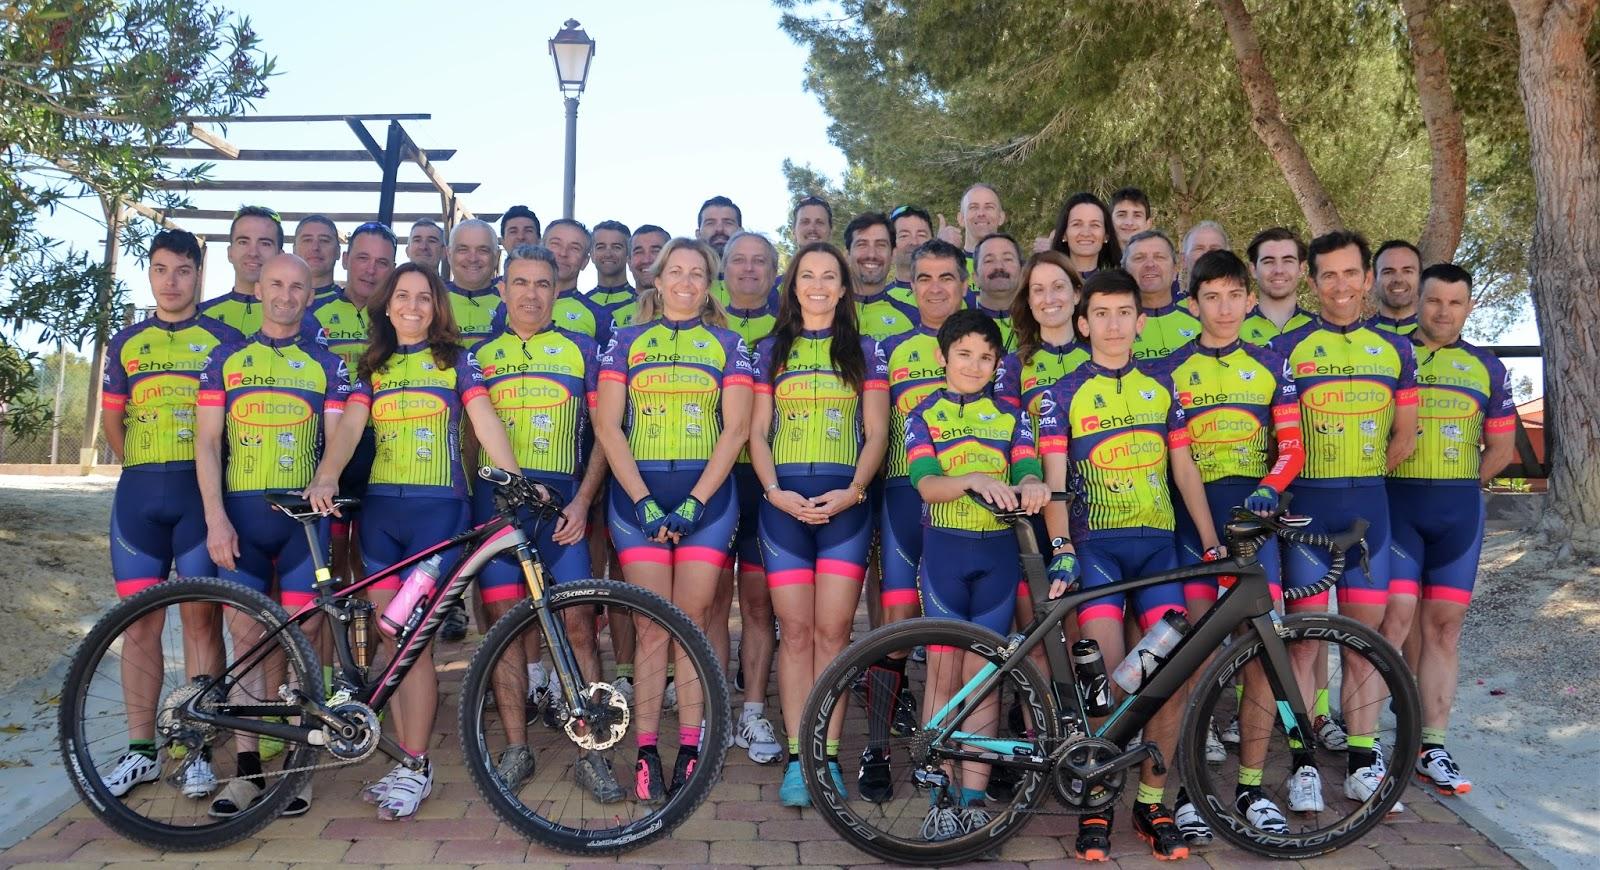 Club Ciclista La Alcayna-Altorreal. Molina de Segura (Murcia ...